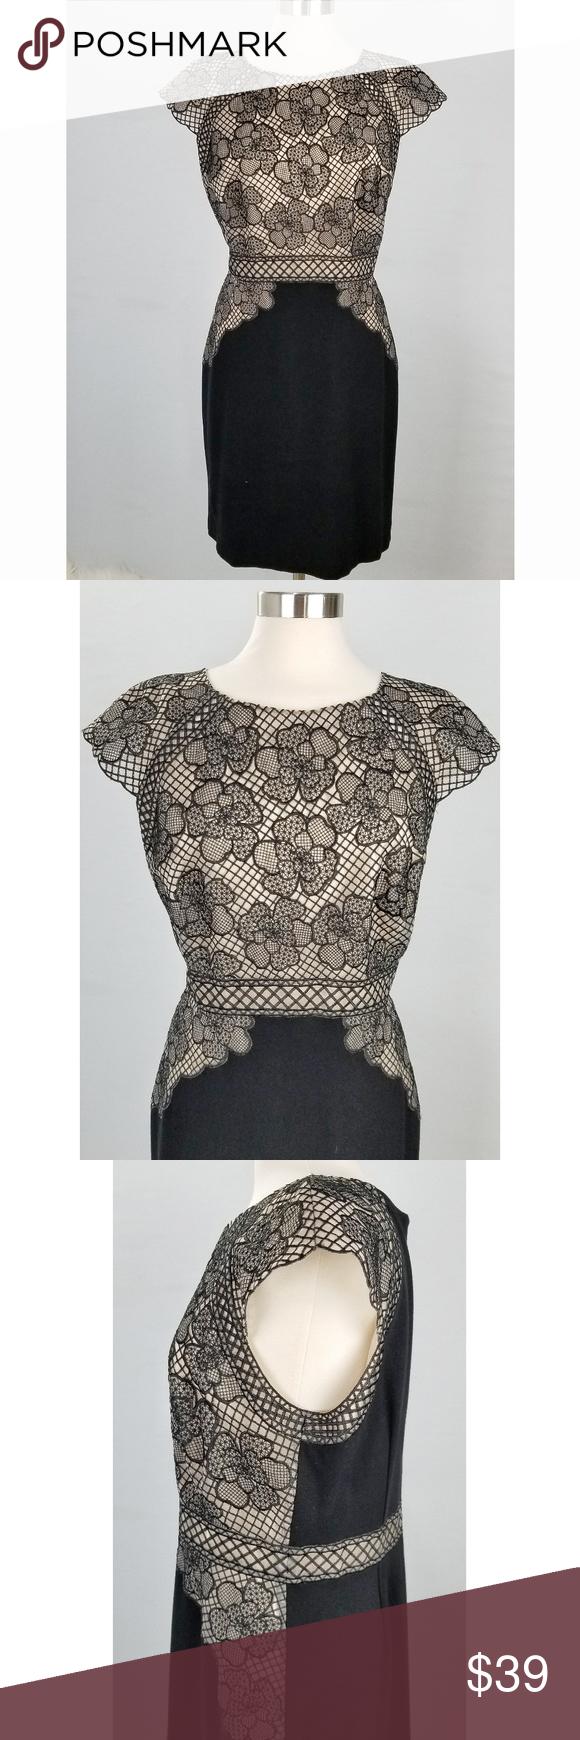 Antonio Melani Black Lace Cream Dress Size 14 Cream Cocktail Dresses Size 14 Dresses Cream Dress [ 1740 x 580 Pixel ]